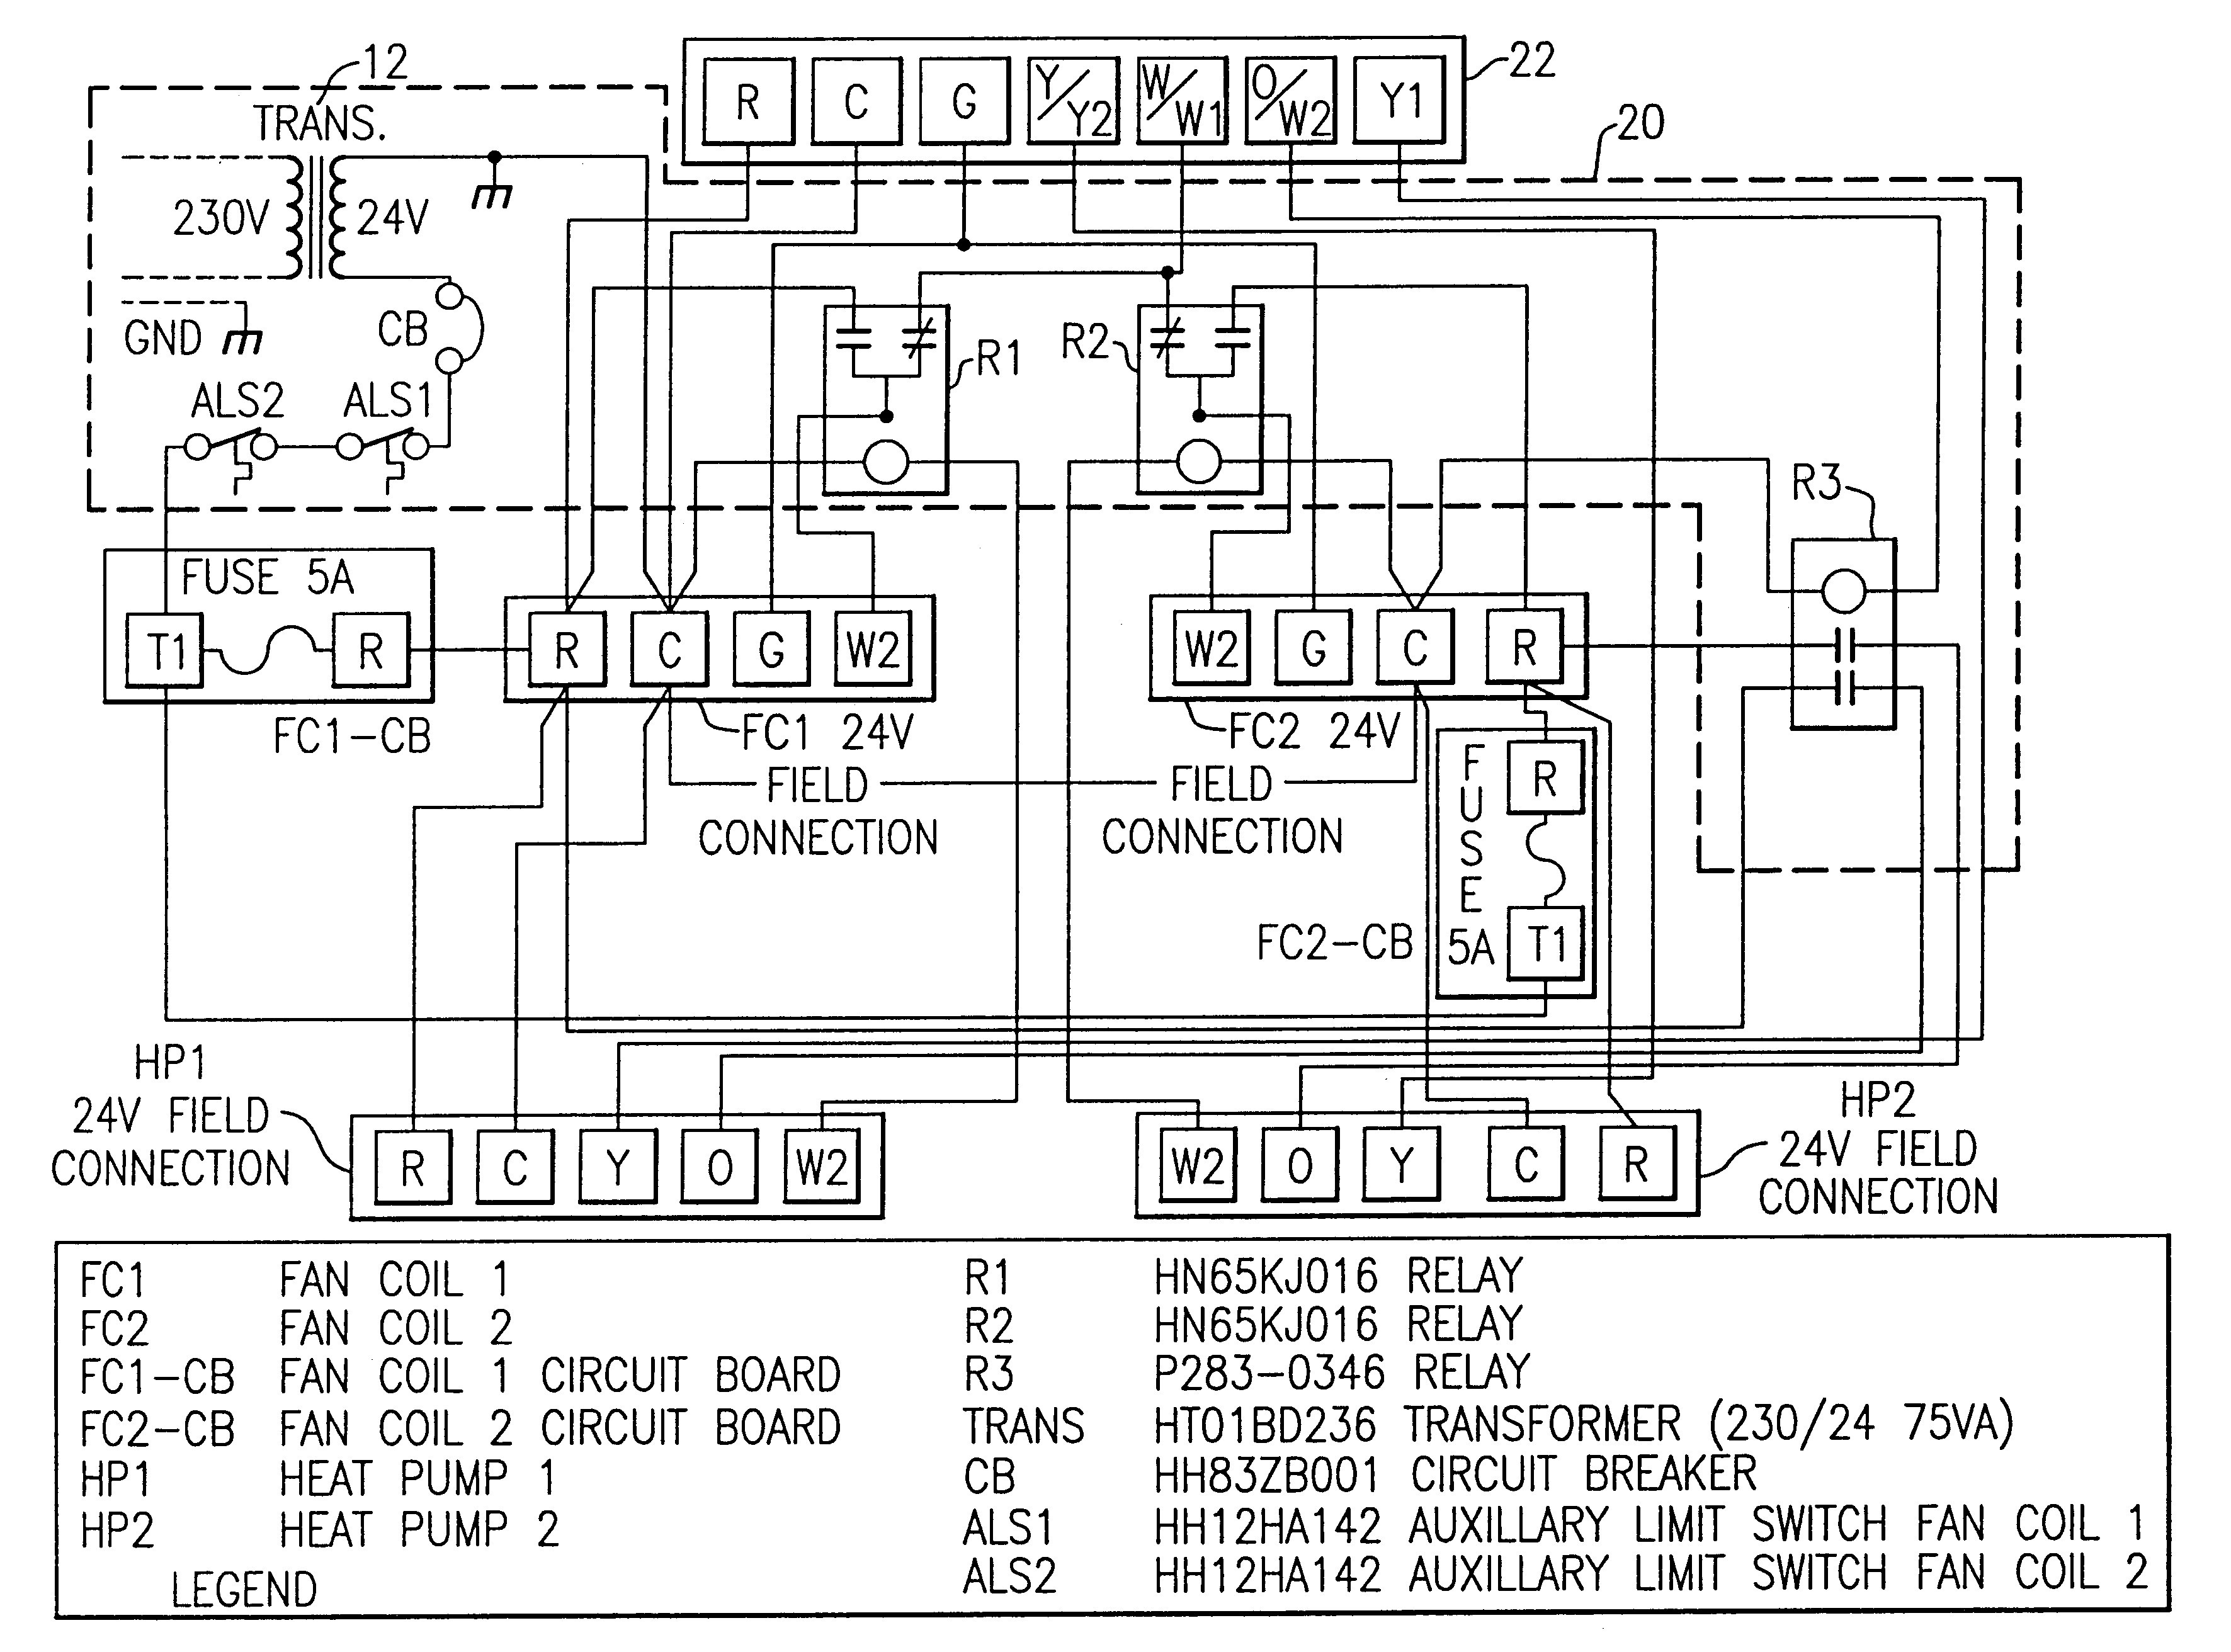 heat pump wiring diagrams inspirational electric heat strip wiring rh detoxicrecenze com York Heat Pump Thermostat Wiring Diagram Heat Pump Wiring Diagram Schematic